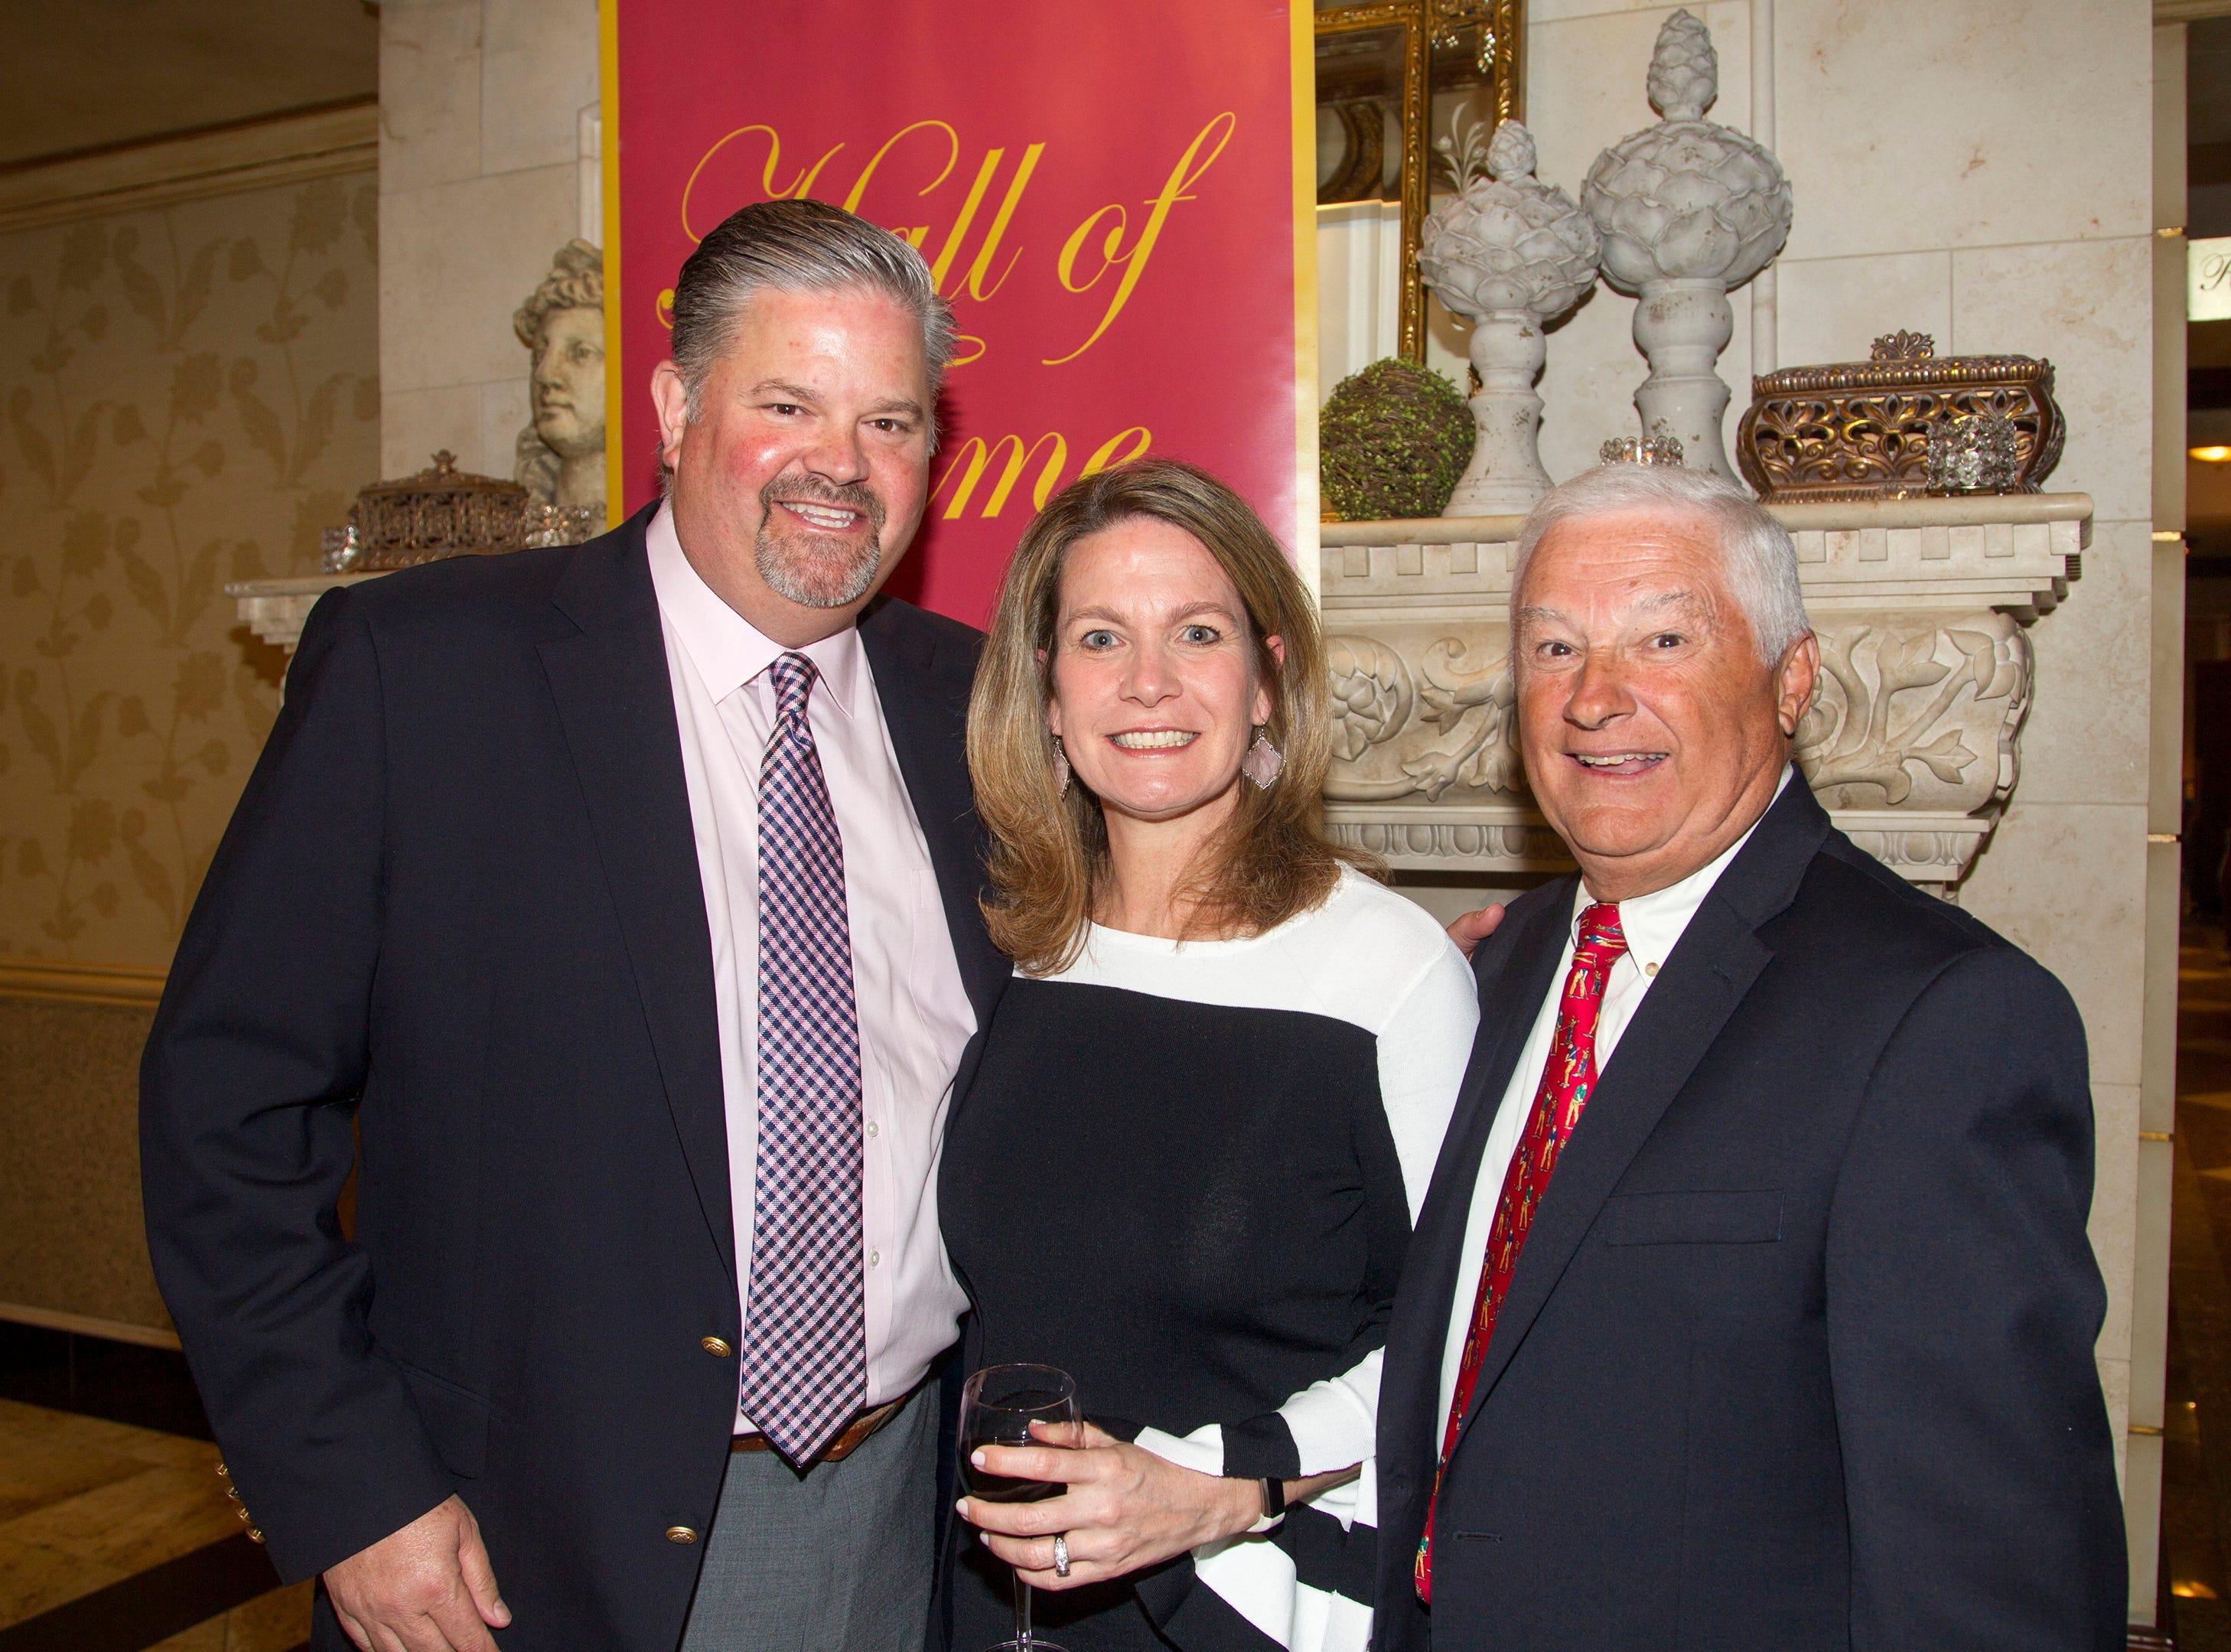 Chris and Melissa Hartigan, Jack O'Reilly. Bergen Catholic High School Hall of Fame Dinner at Seasons in Washington Twp. 03/31/2019